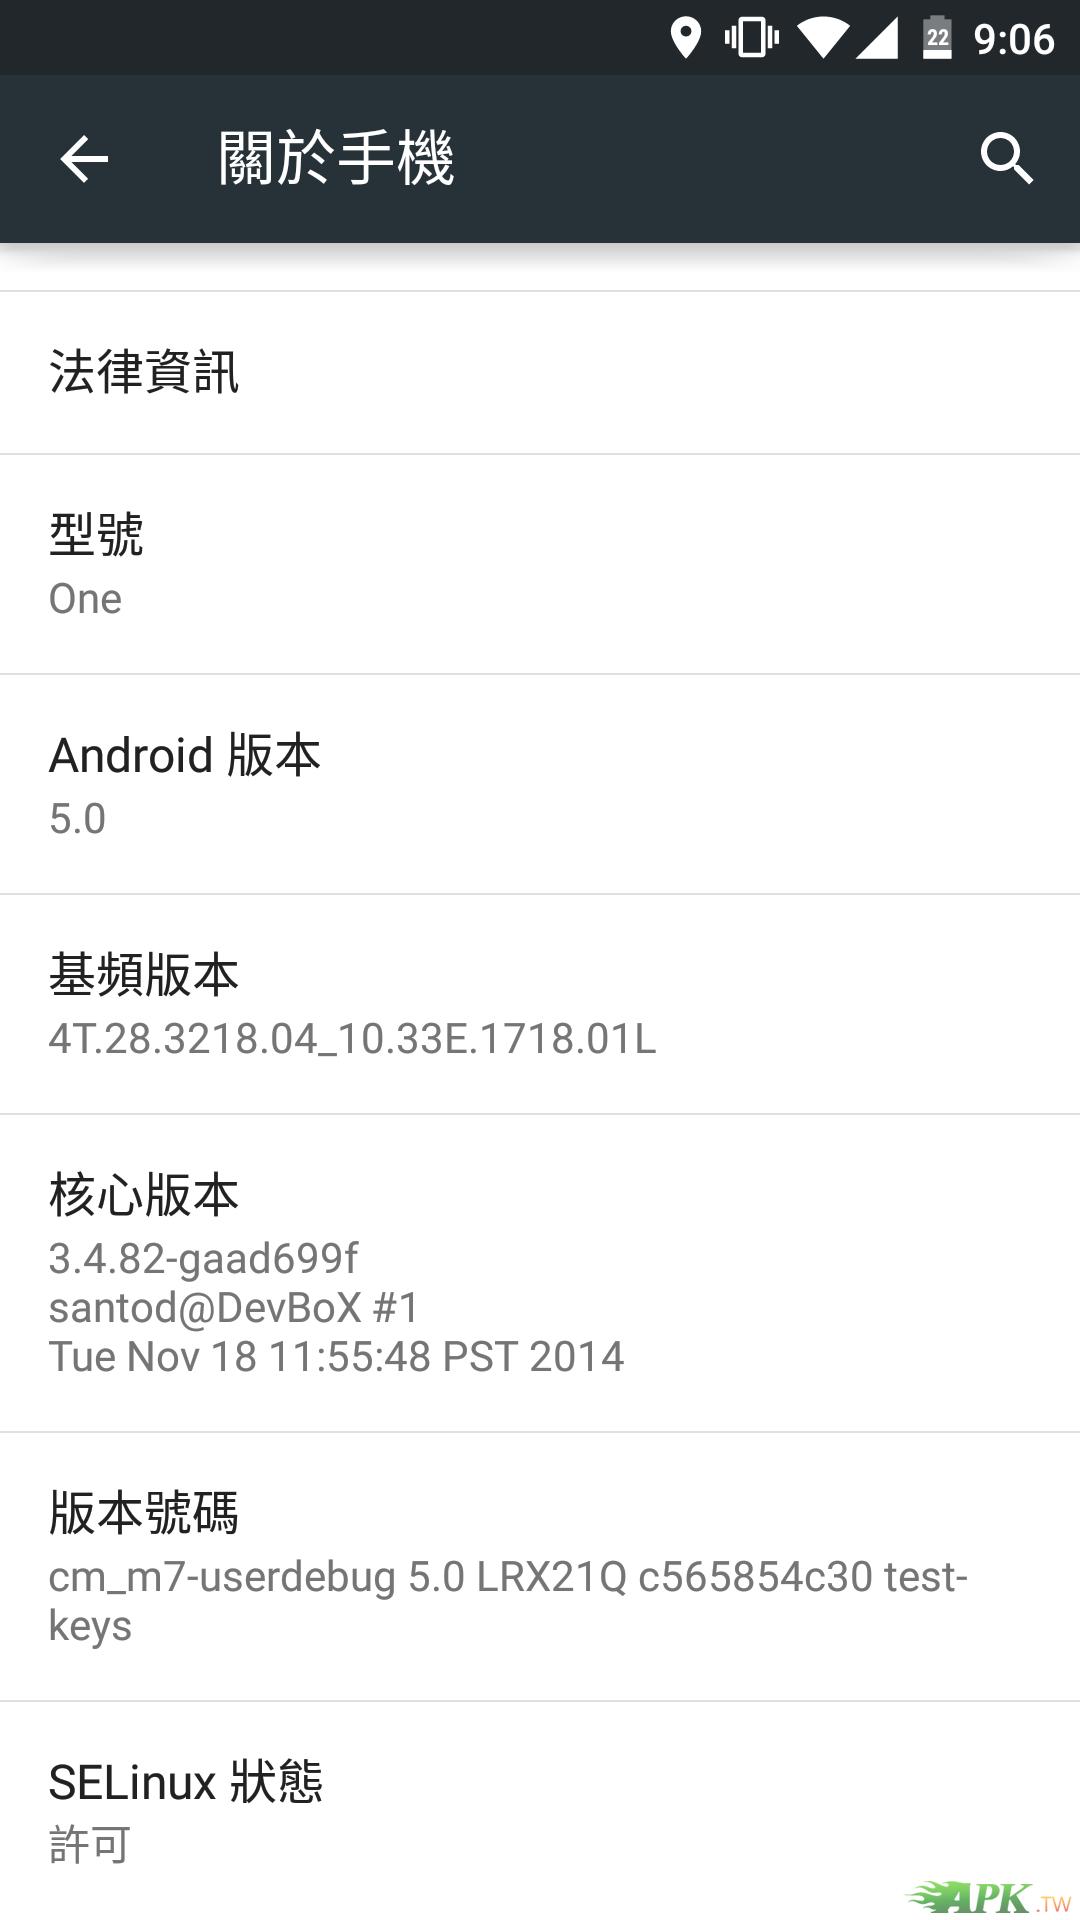 Screenshot_2014-11-20-21-06-05.png